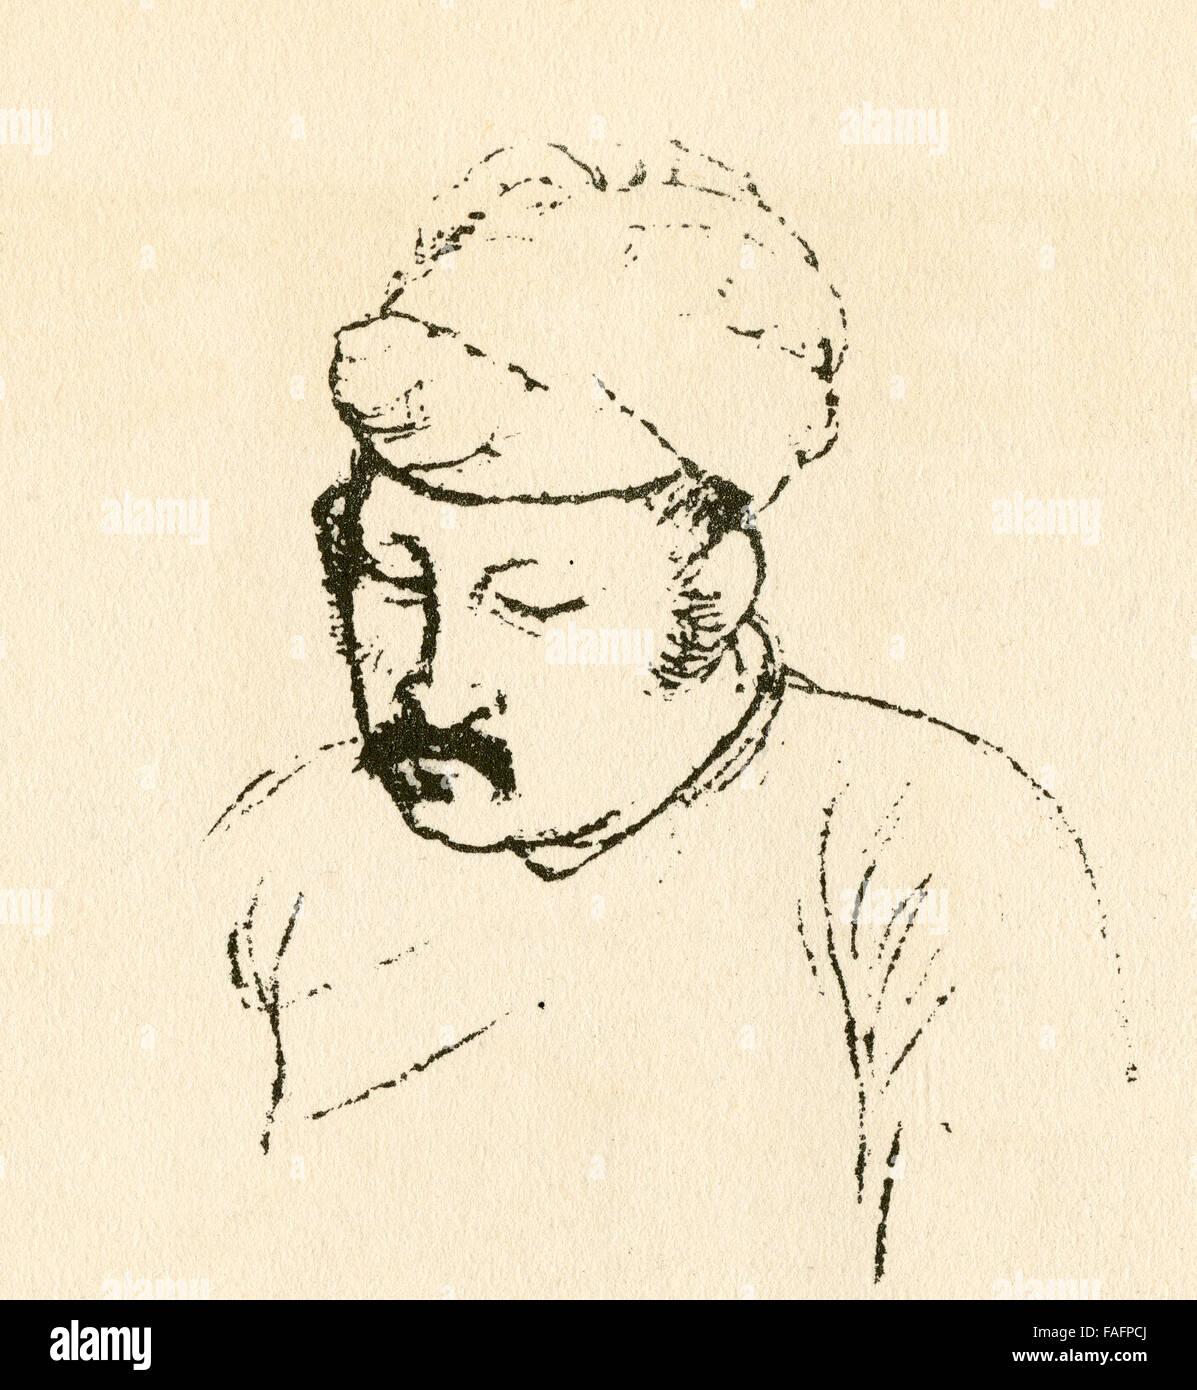 Abu'l-Fath Jalal ud-din Muhammad Akbar, aka Akbar I and Akbar the Great, 1542 - 1605.  3rd Mughal Emperor. - Stock Image